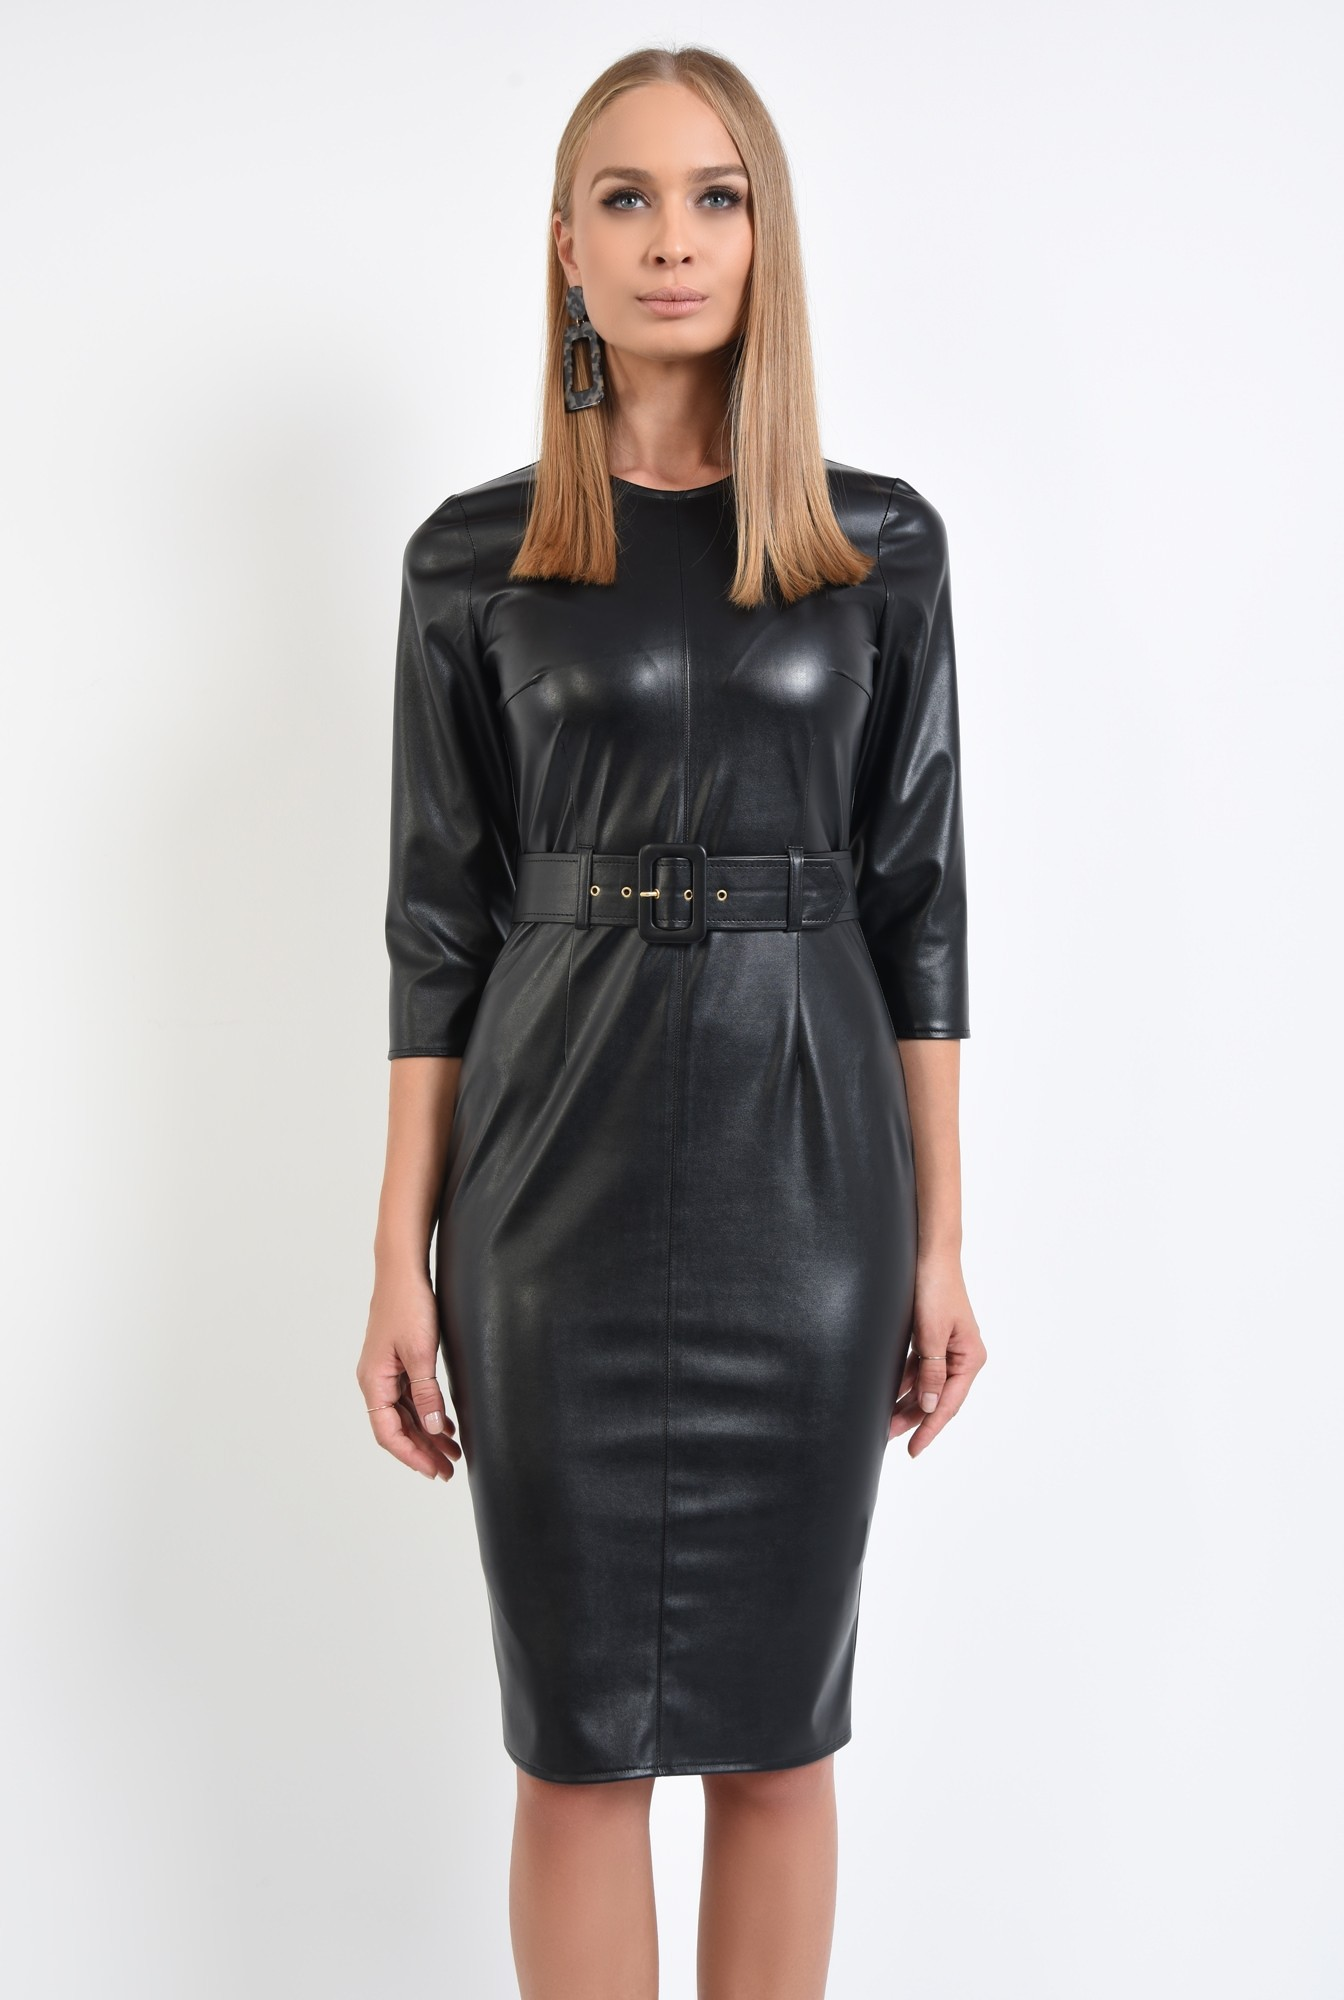 2 - rochie de toamna, neagra, croi conic, cu centura